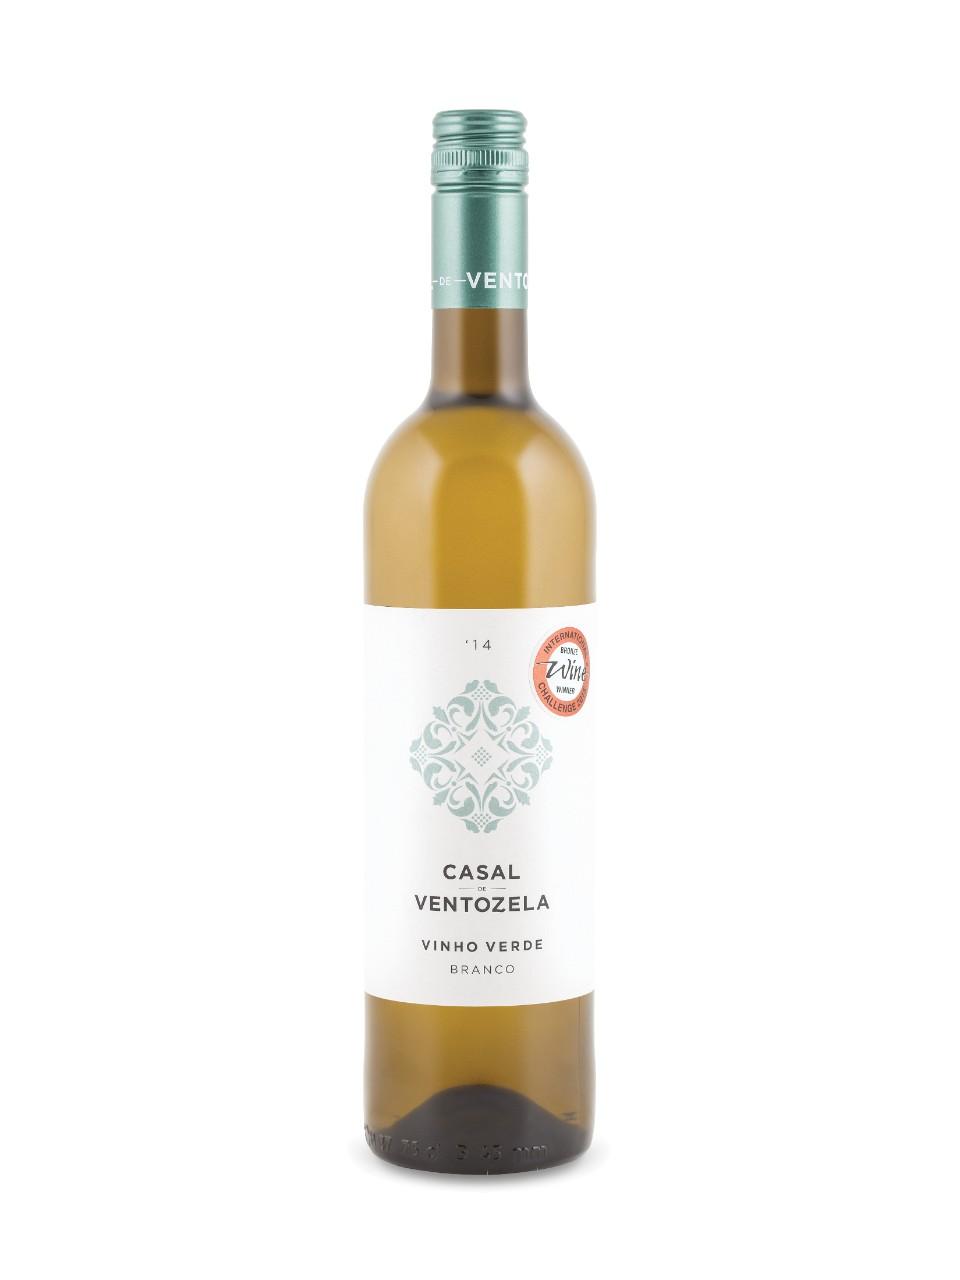 Image for Casal de Ventozela Branco Vinho Verde 2017 from LCBO